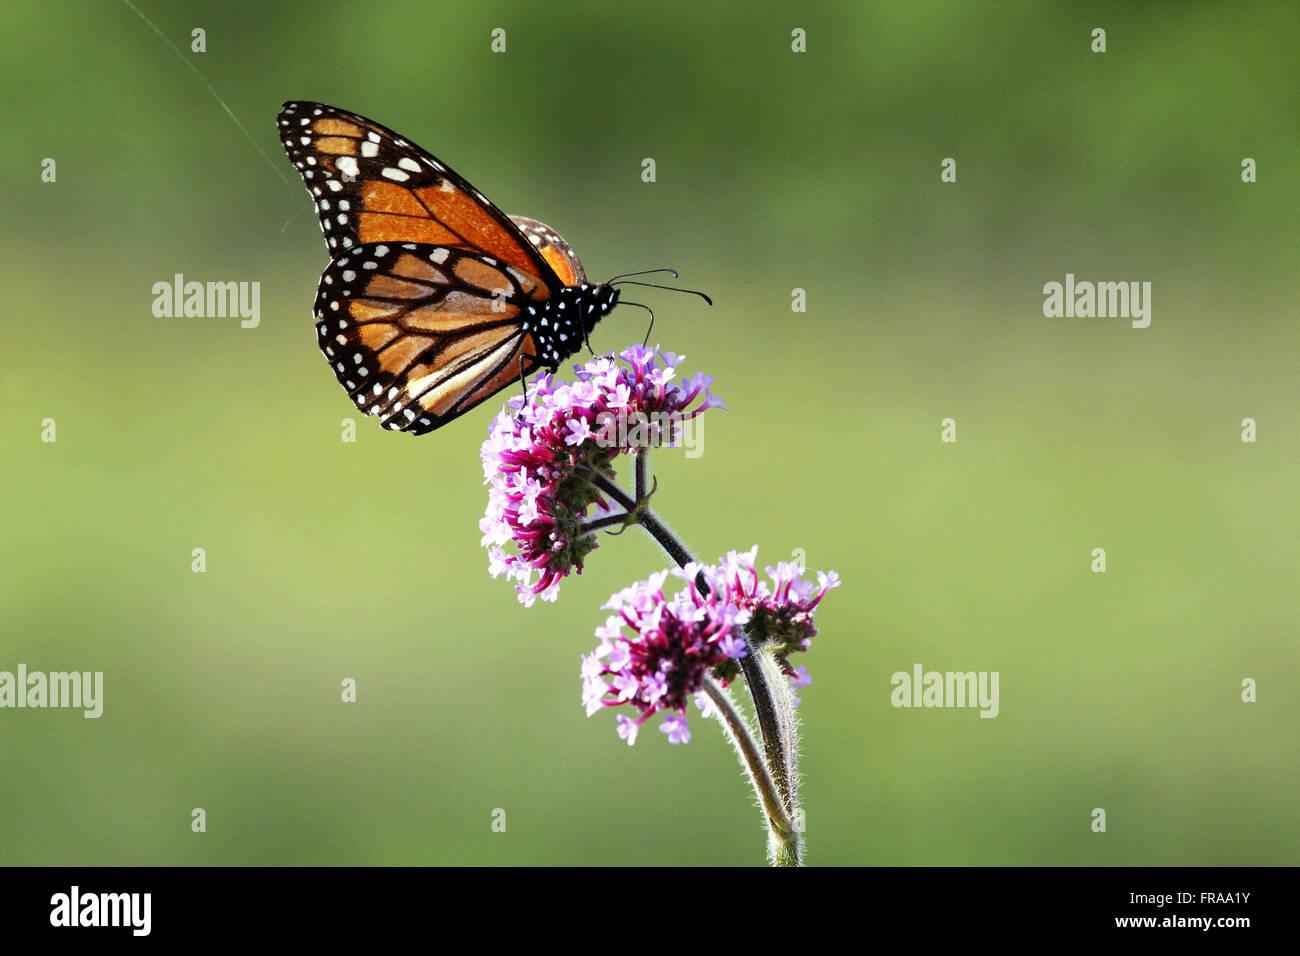 Monarch Butterfly on Flower - Danaus plexippus - Stock Image